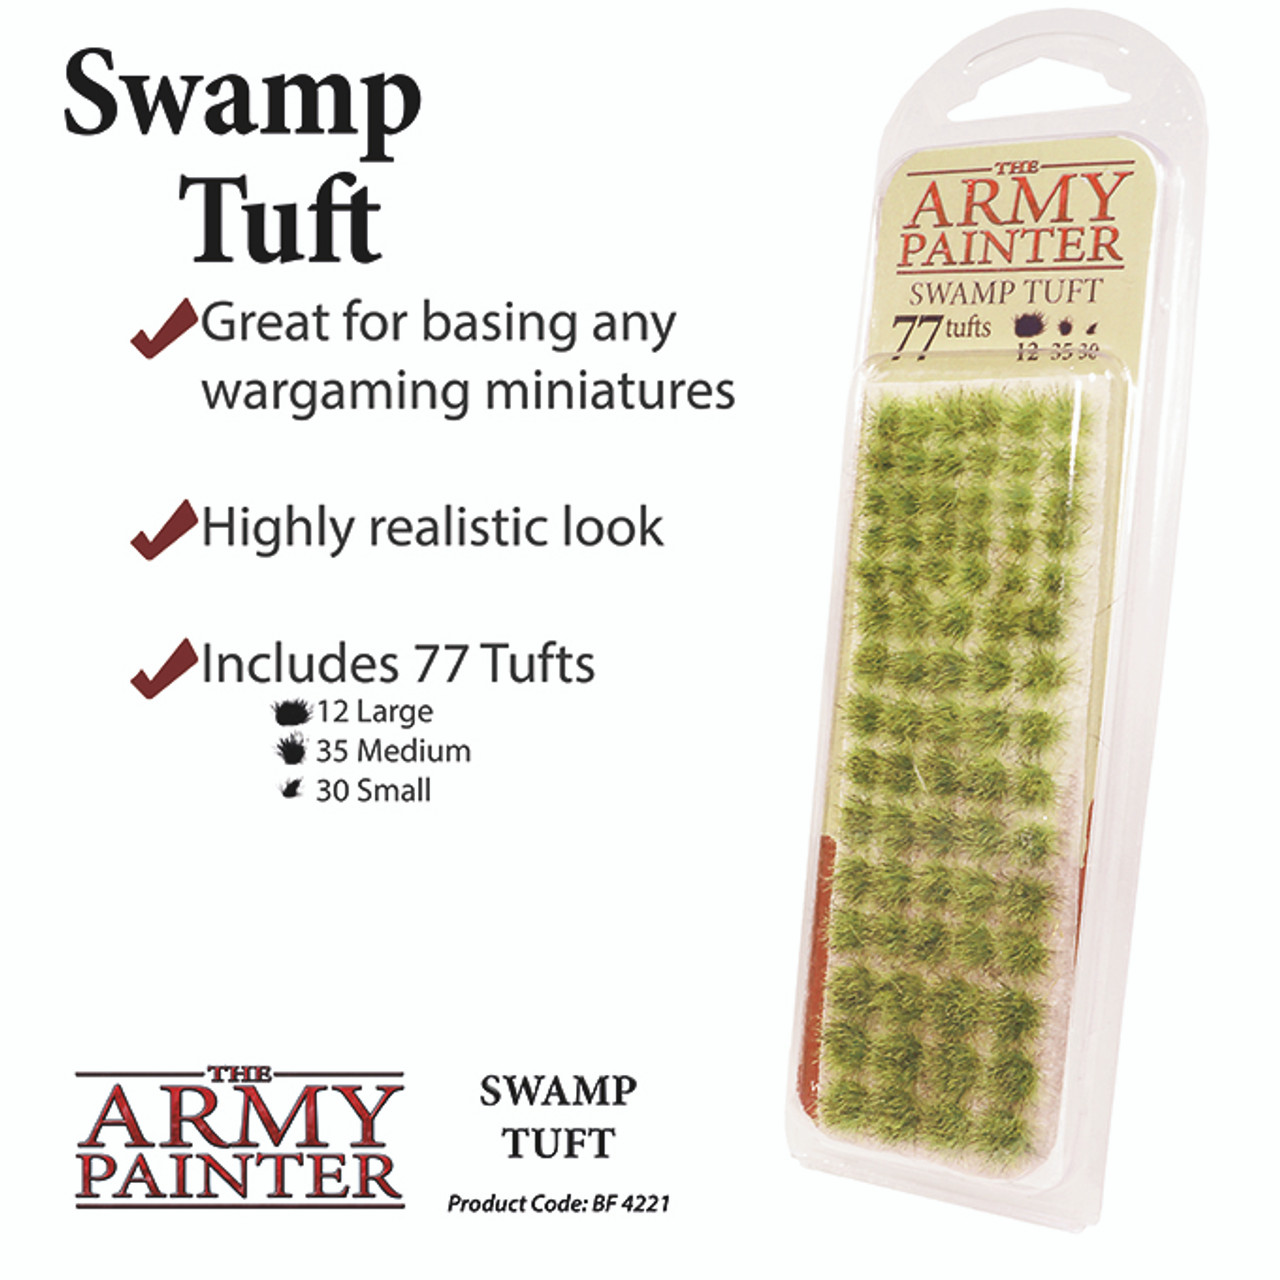 Army Painter Battlefields - Swamp Tuft